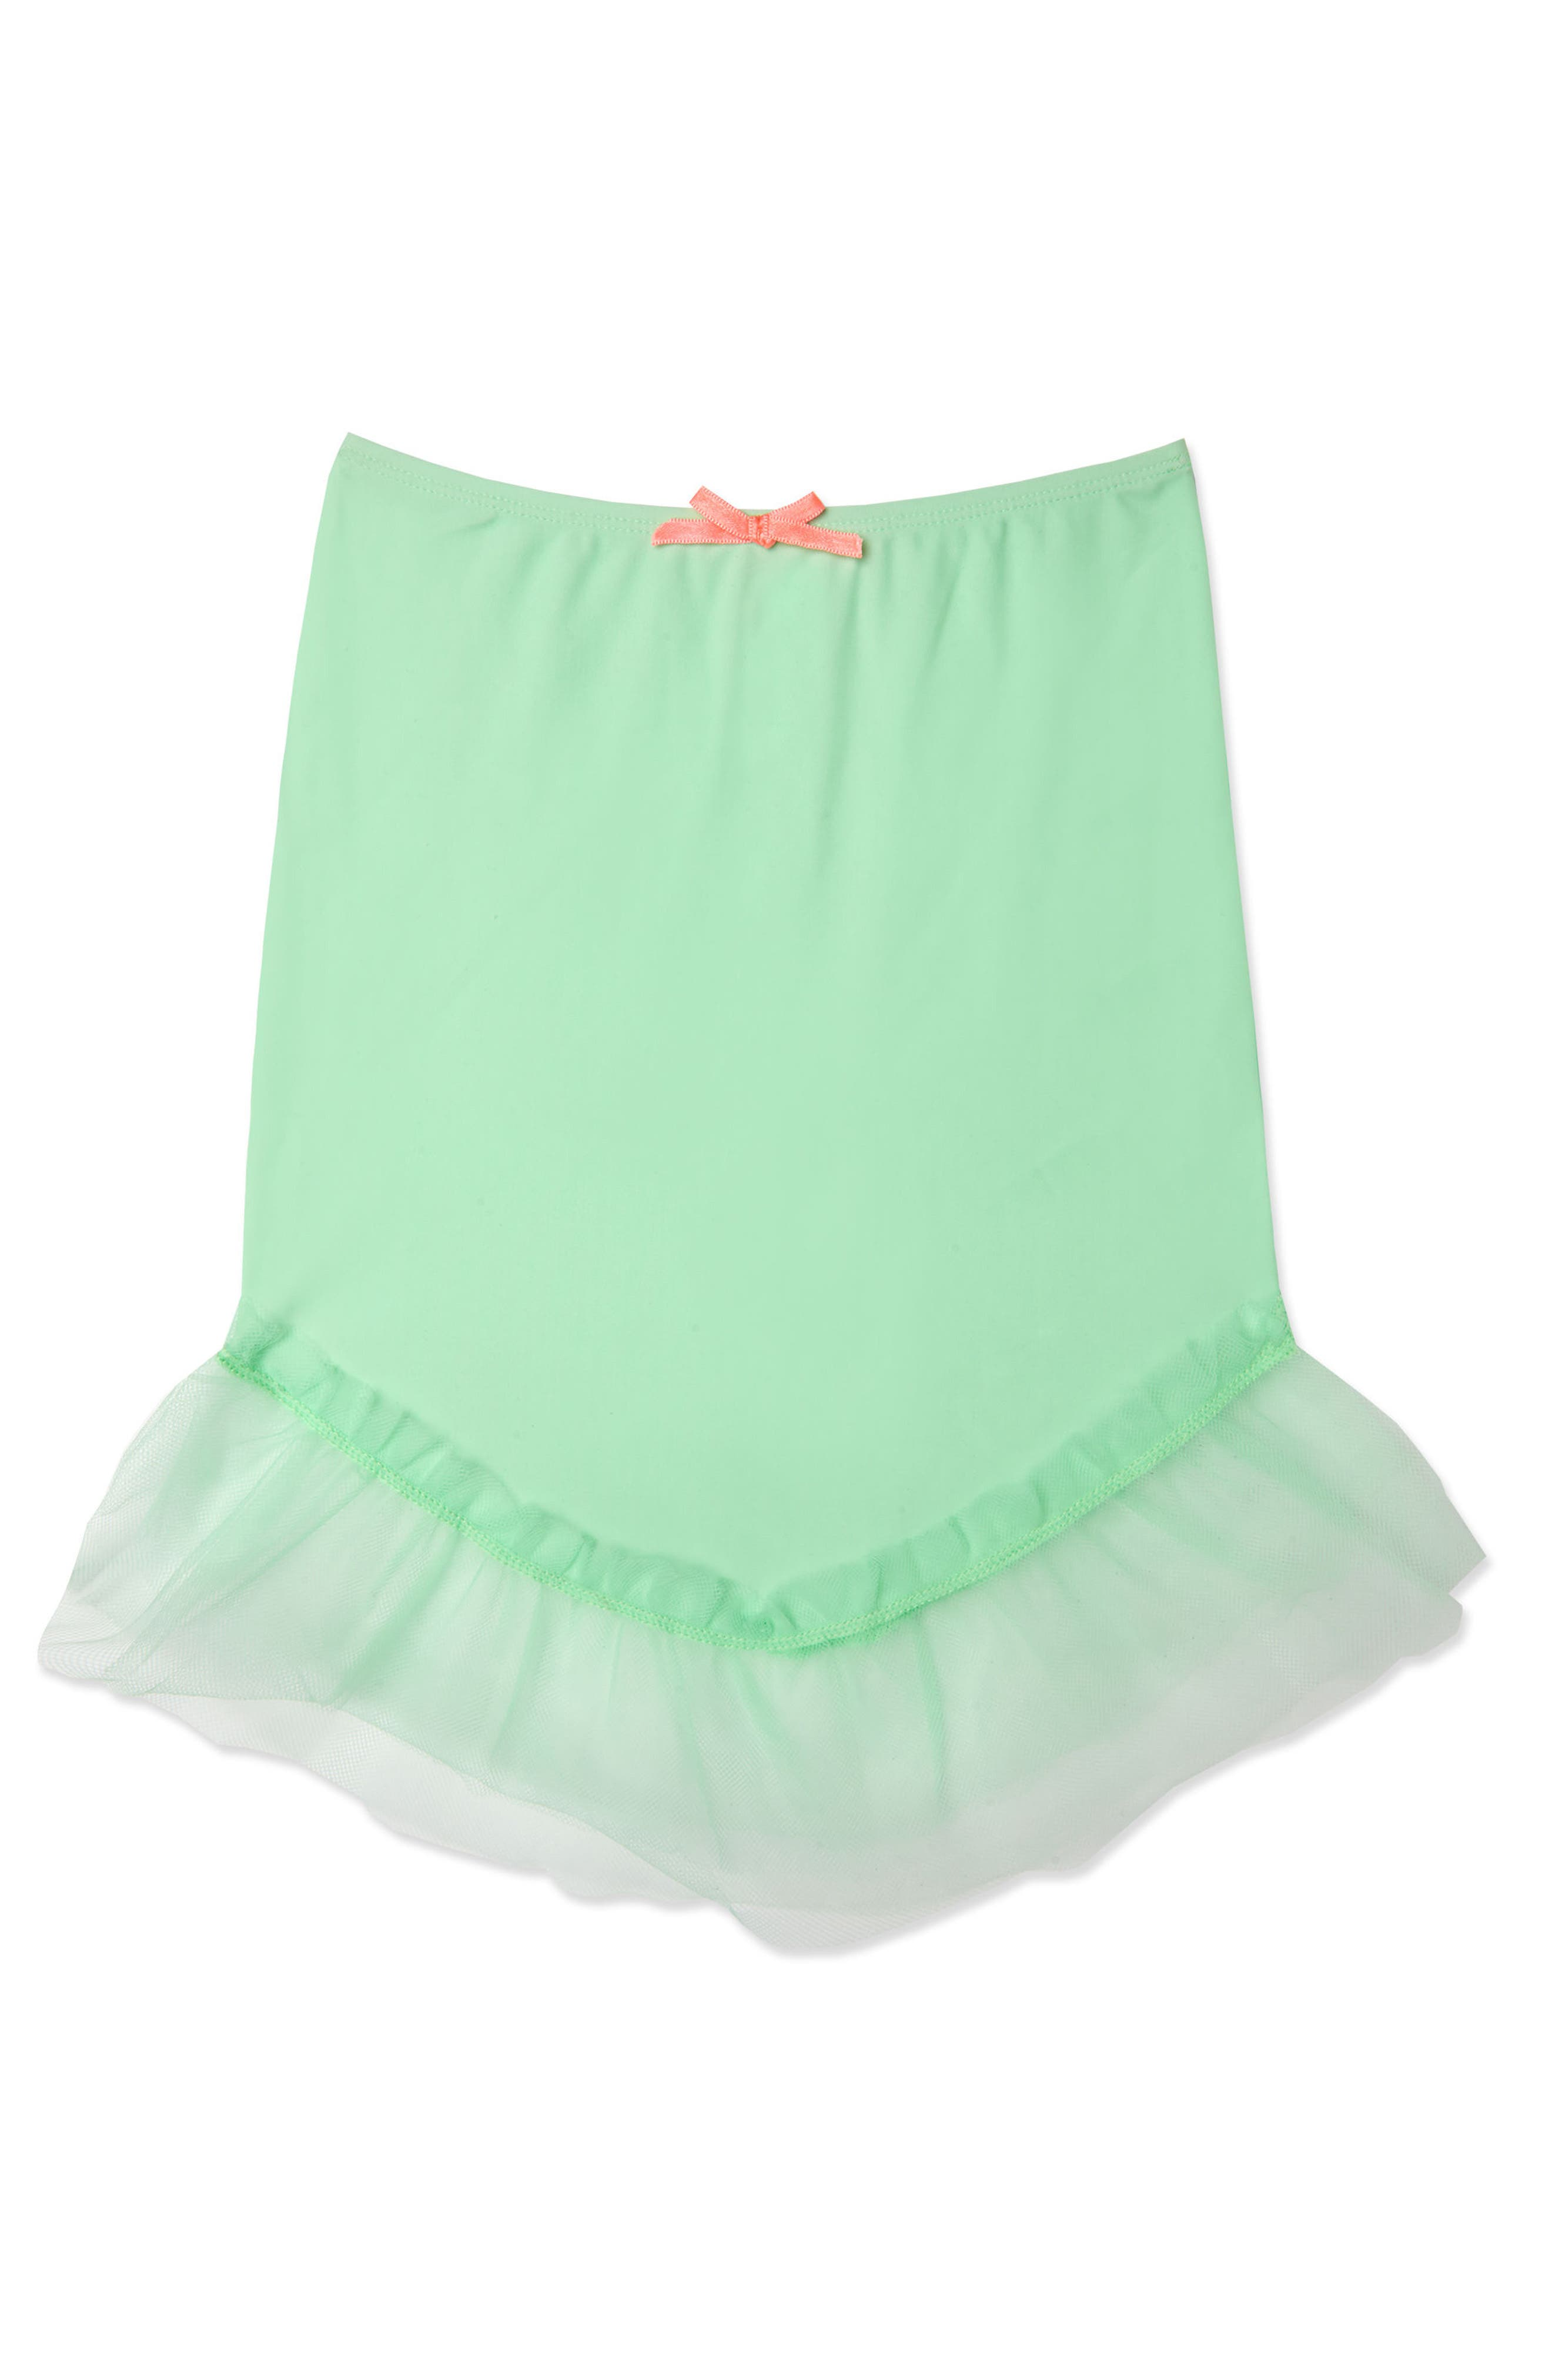 HULA STAR Mermaid Cover-Up Skirt